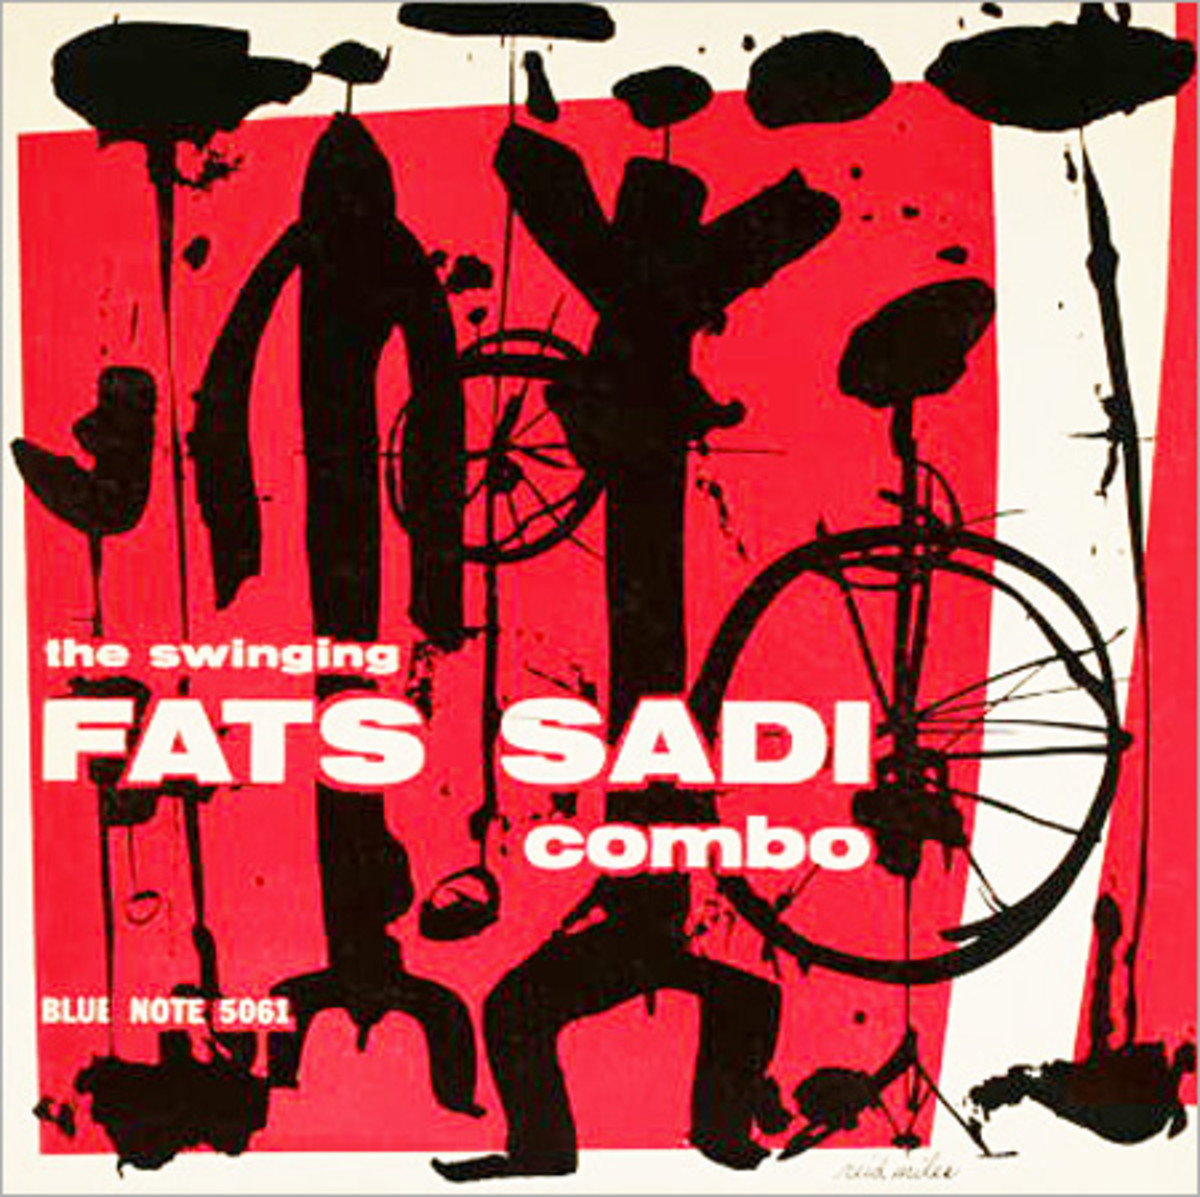 "Fats Sadi Combo ""The Swinging Fats Sadi"" Blue Note Records BLP 5061 10"" LP Vinyl Microgroove Record (1955) Album Cover Design by Reid Miles"